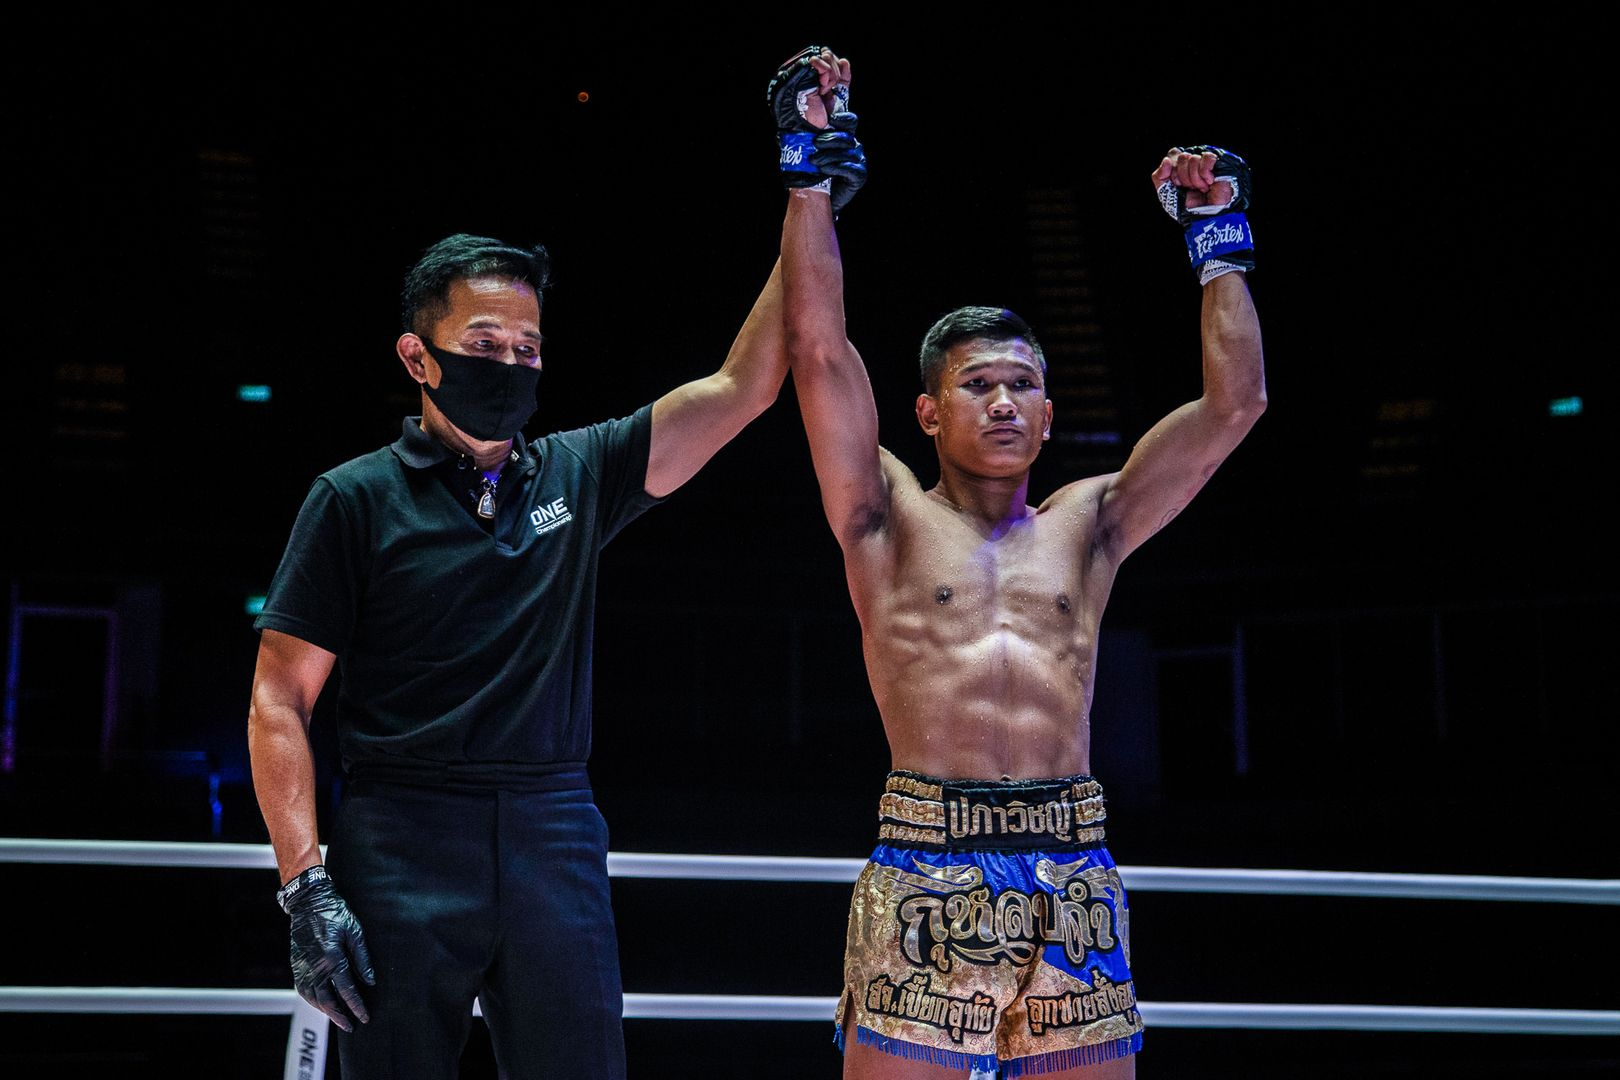 Muay Thai fighter Kulabdam defeats Sangmanee via knockout